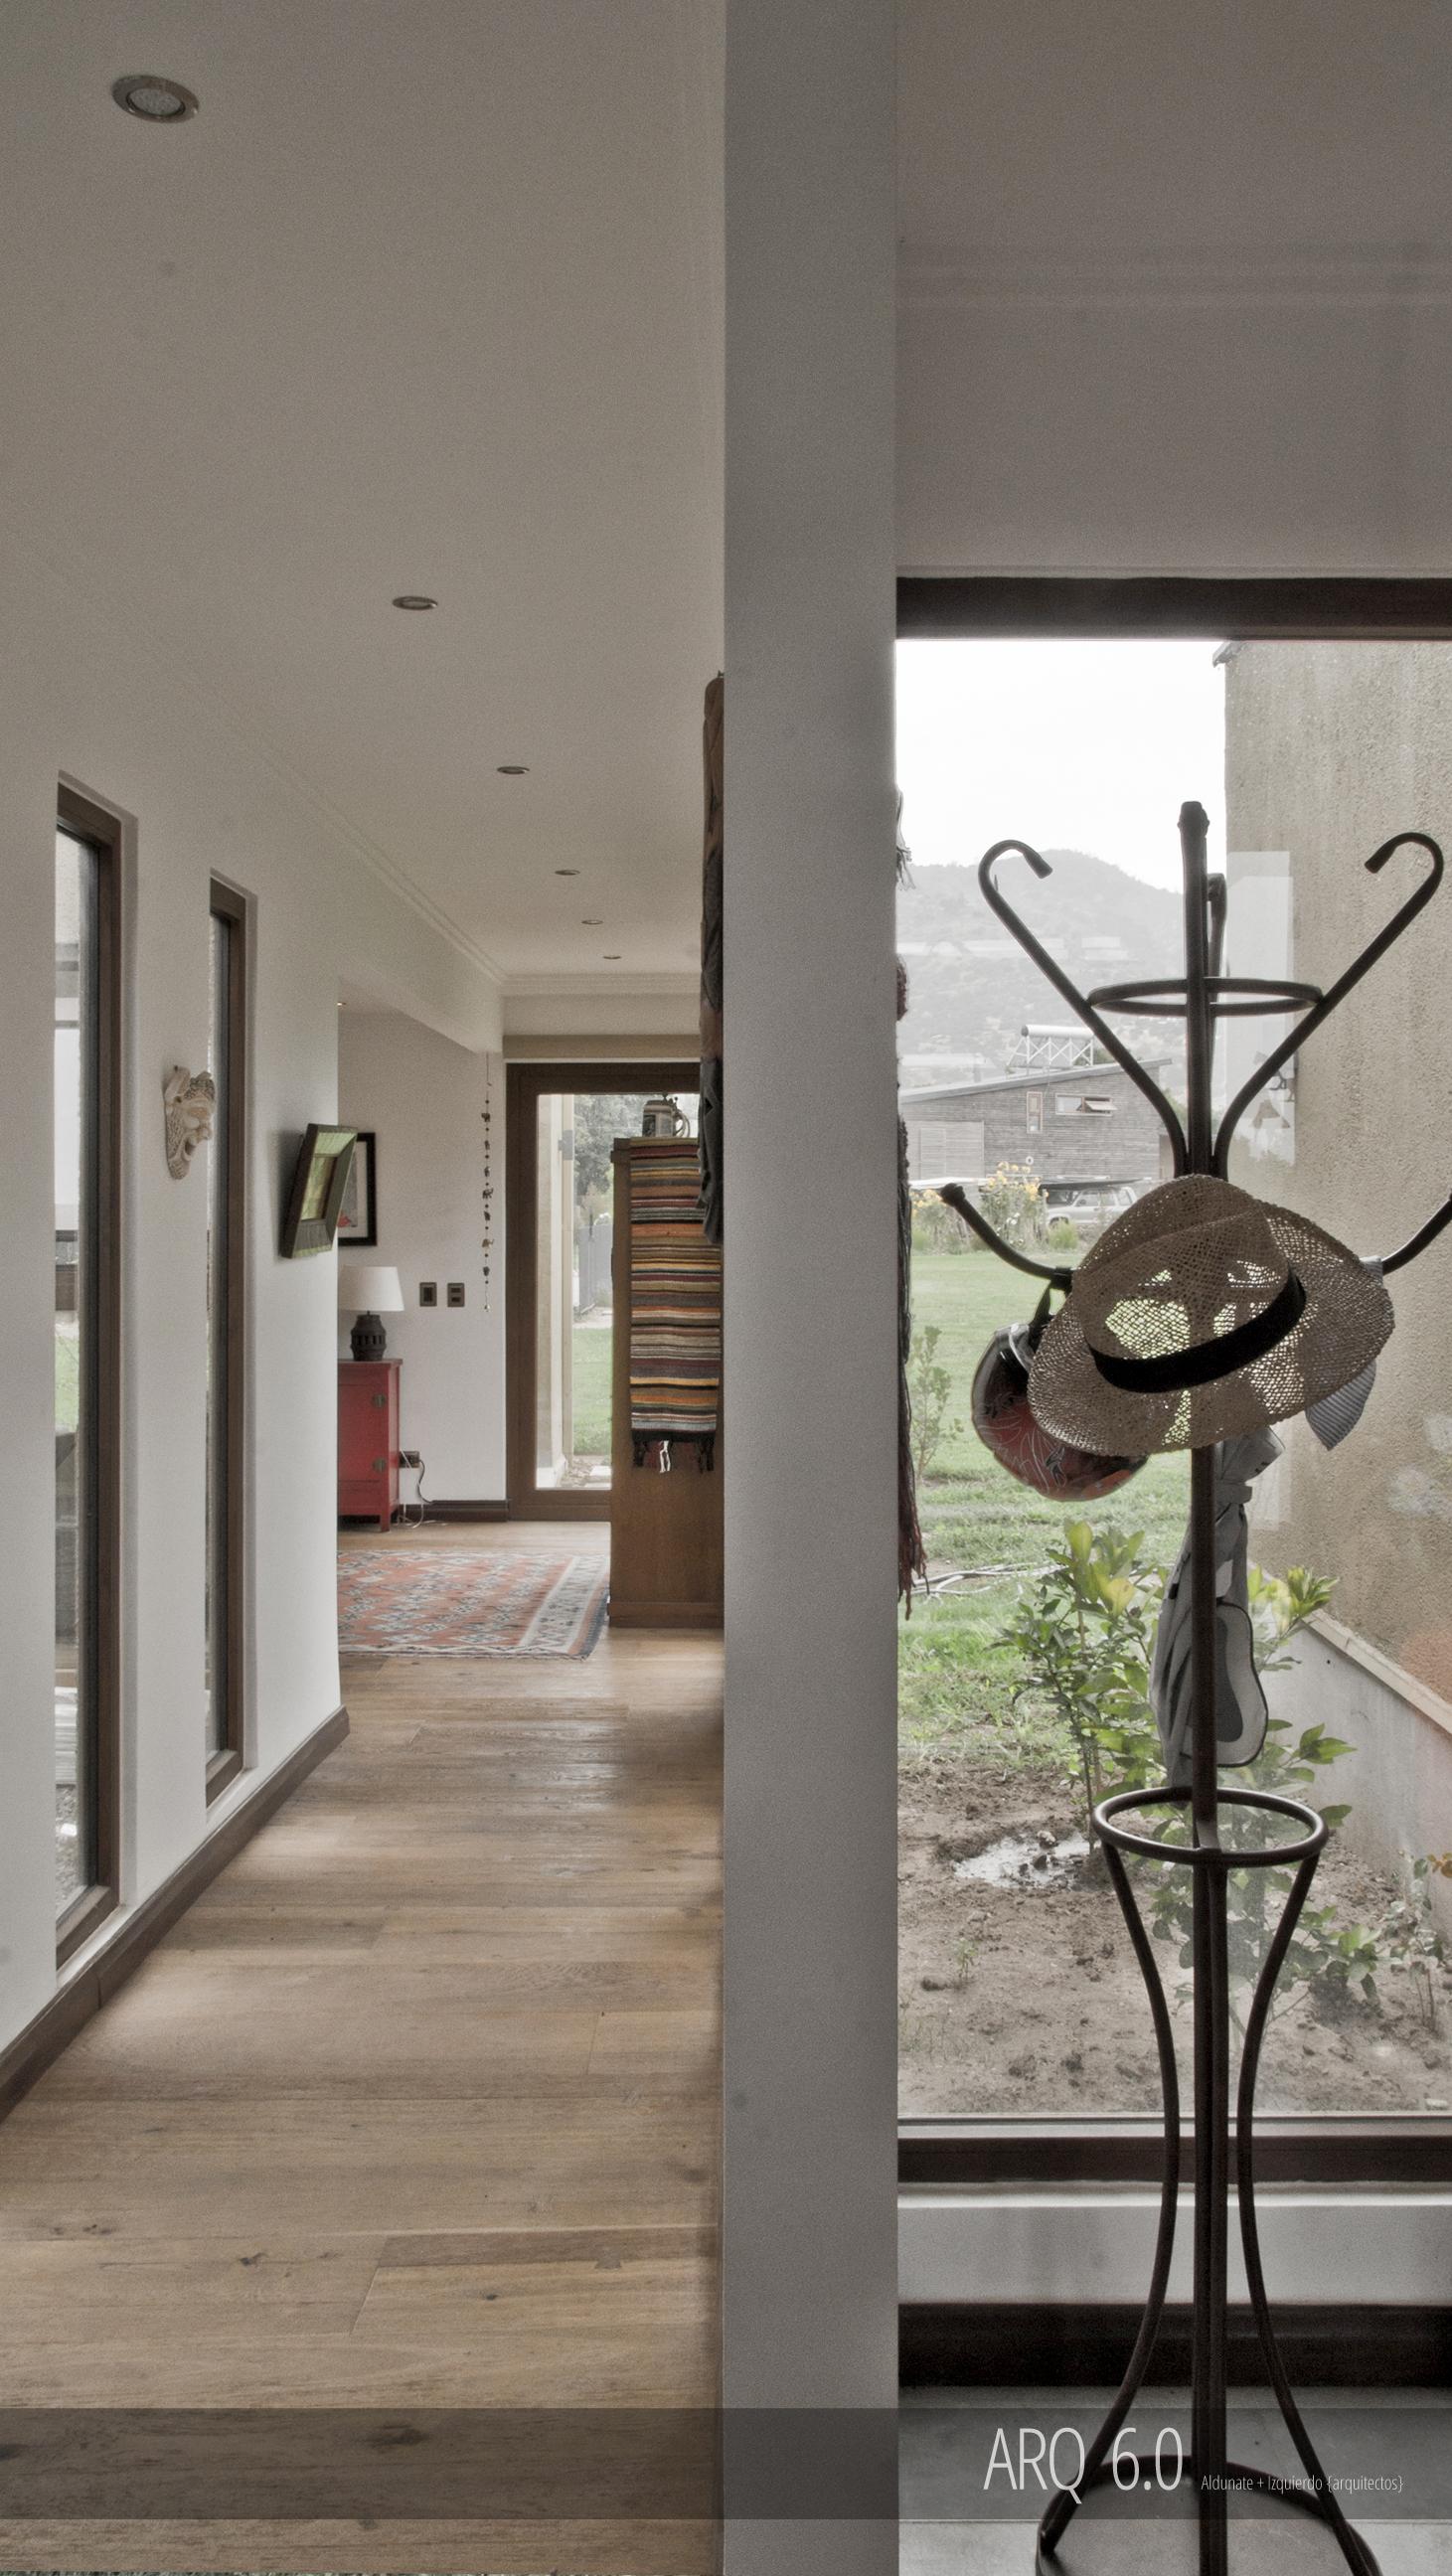 Arq6 - Casa Elzo Montero 43